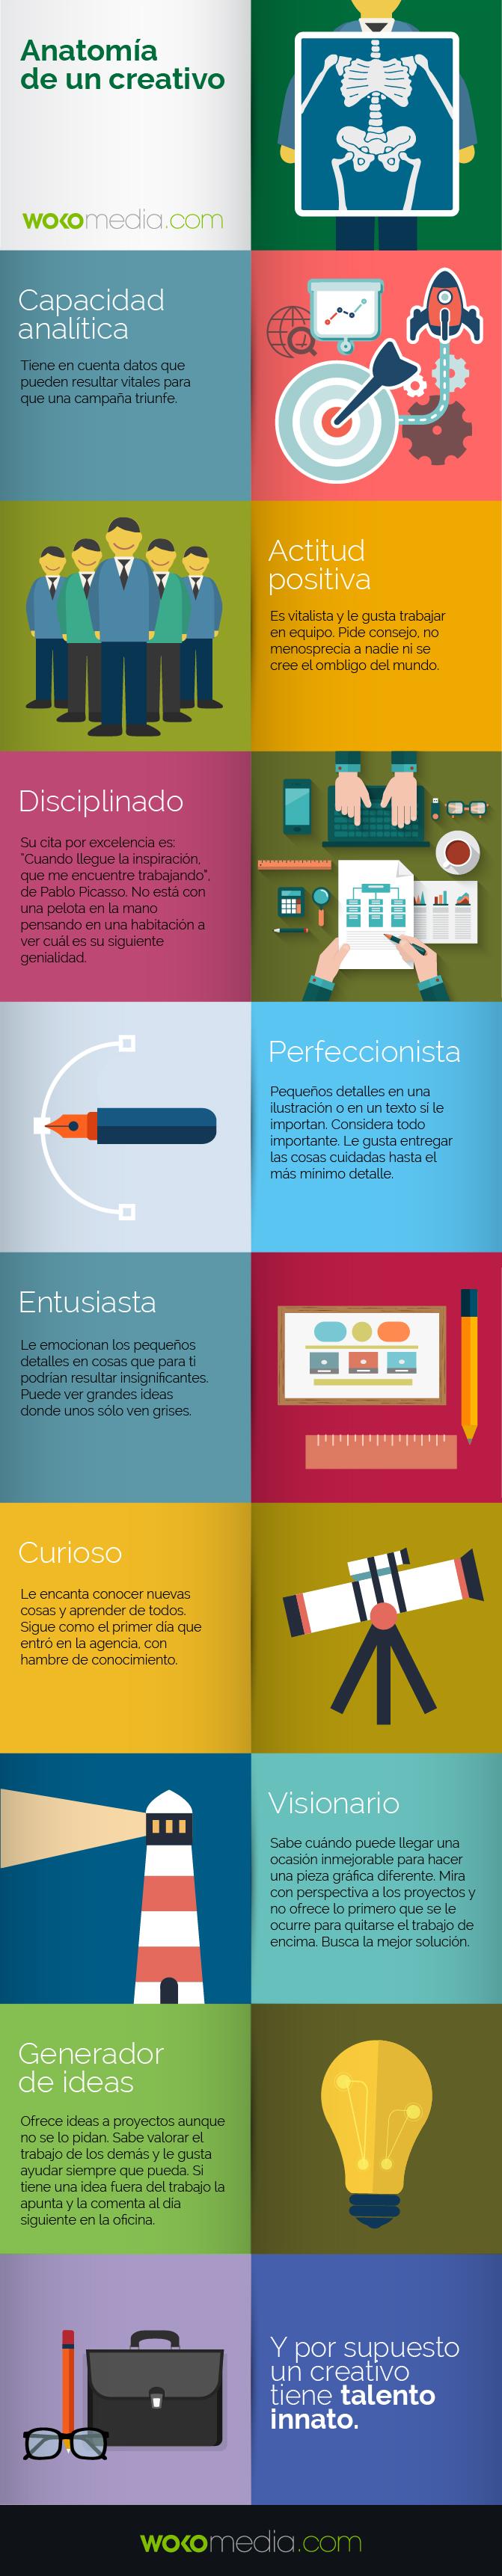 Anatomía de un creativo de marketing #infografia   TUTORIA ARRL ...